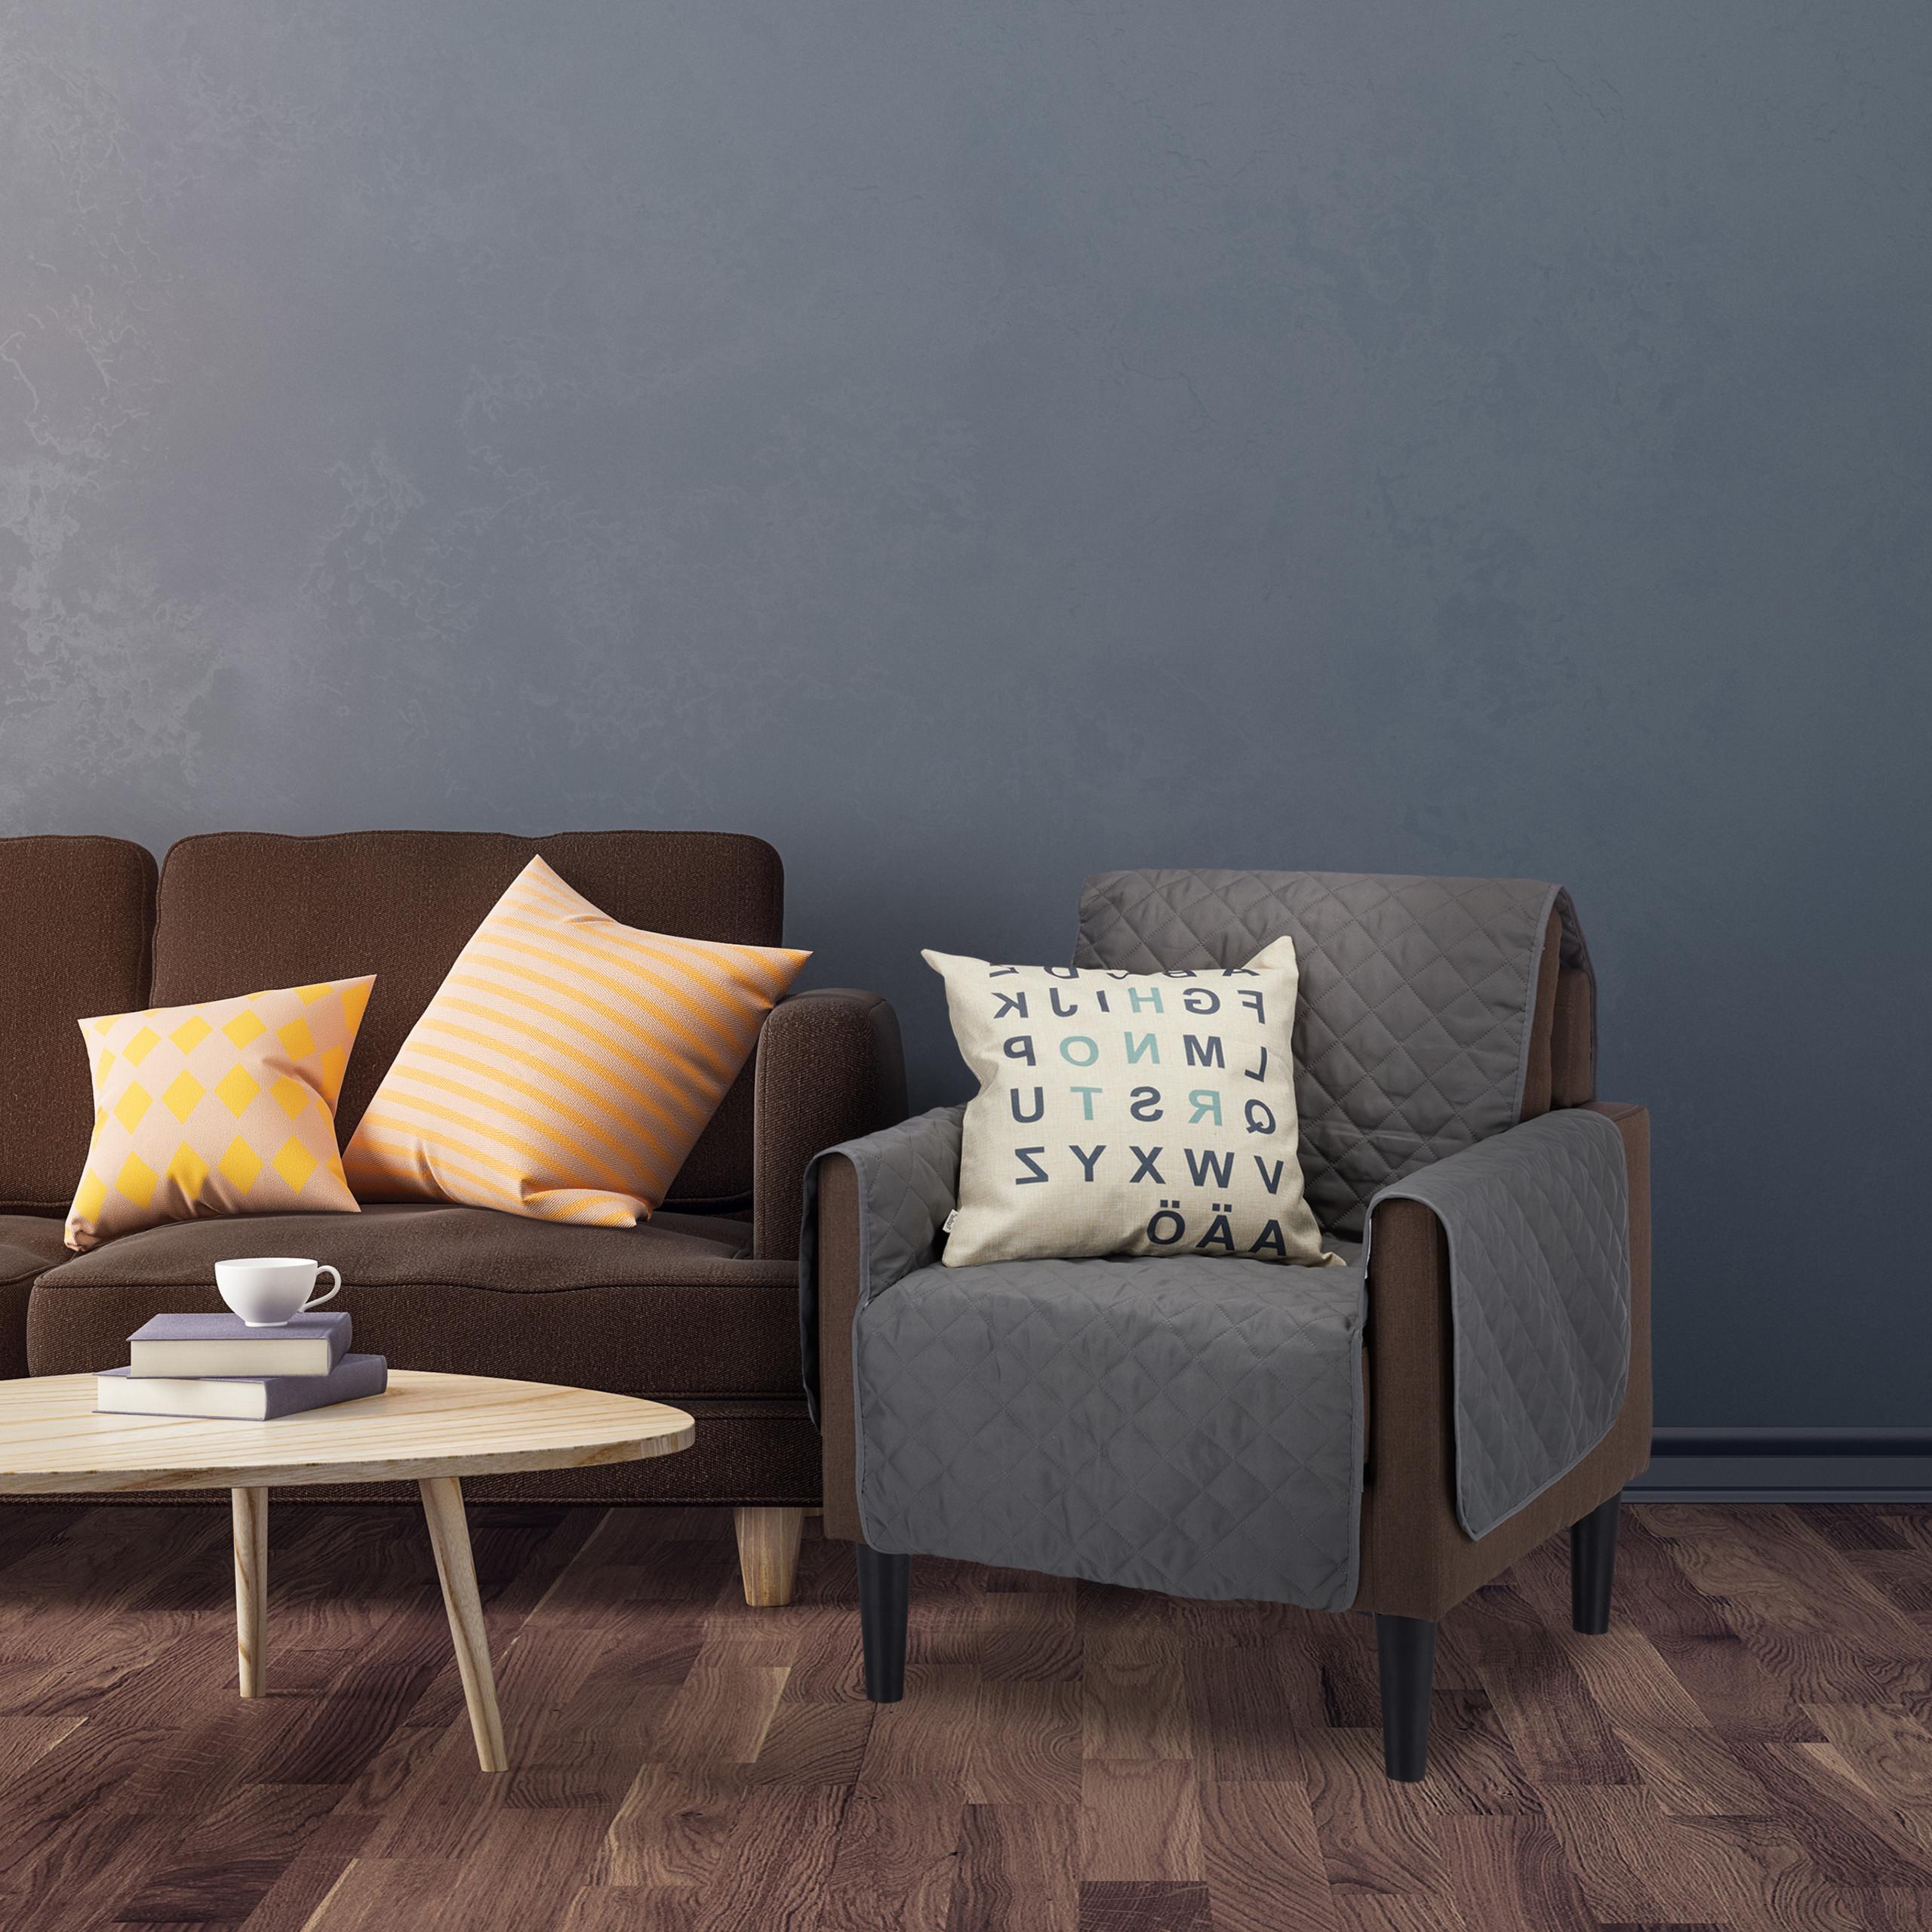 housse canap housse fauteuil protection rev tement plaid poils animaux t ches ebay. Black Bedroom Furniture Sets. Home Design Ideas